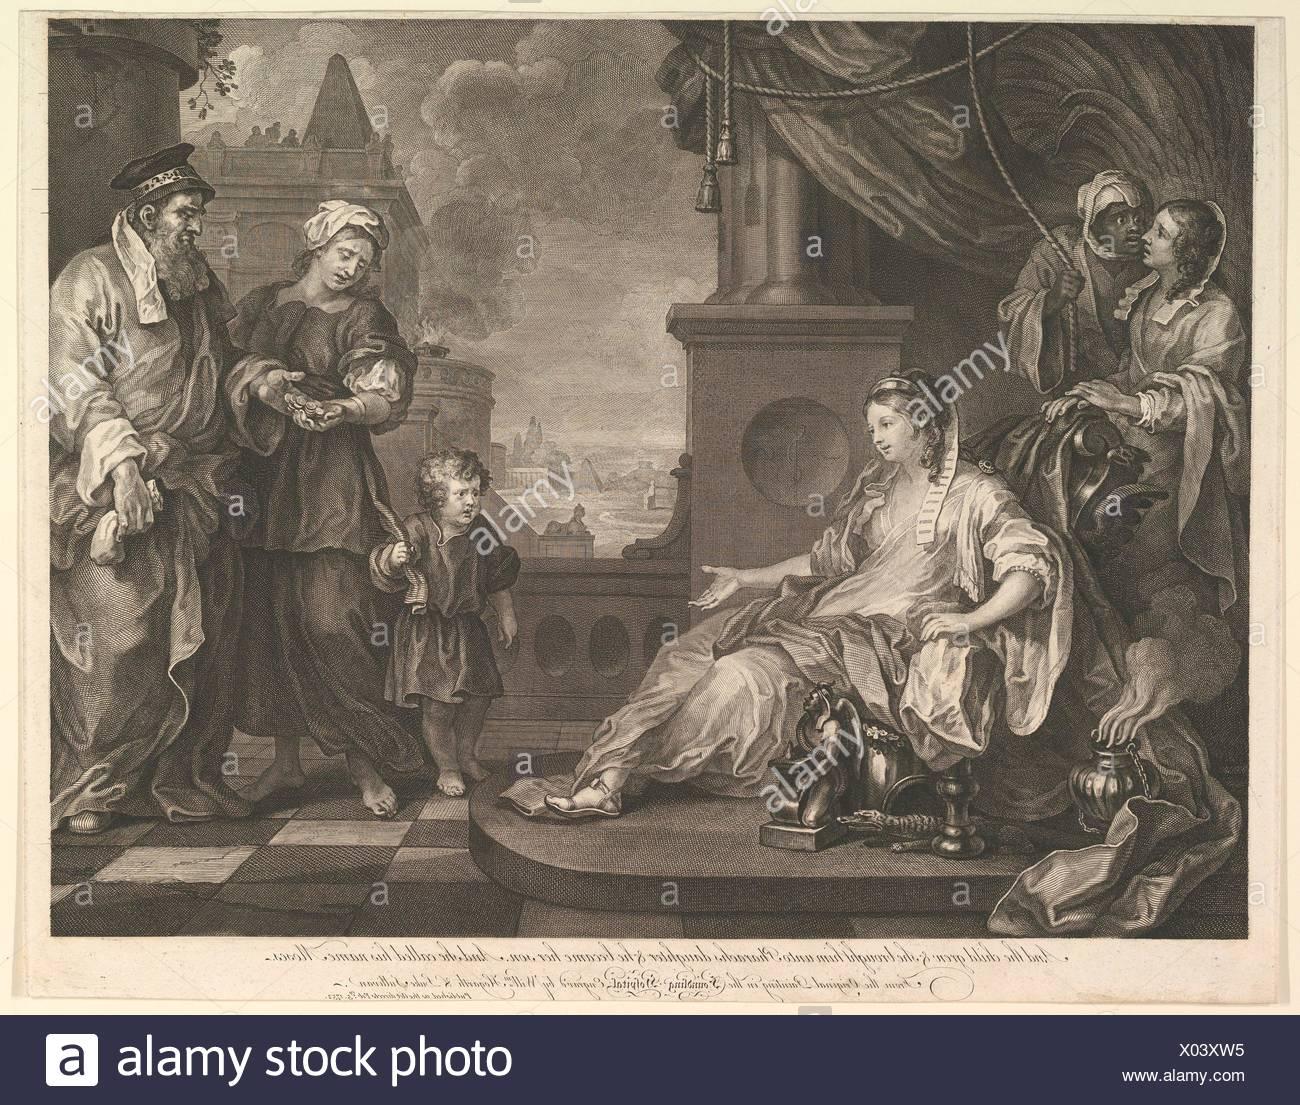 Moses Brought to Pharaoh's Daughter. Artist and engraver: William Hogarth  (British, London 1697-1764 London); Engraver: Luke Sullivan (Irish,